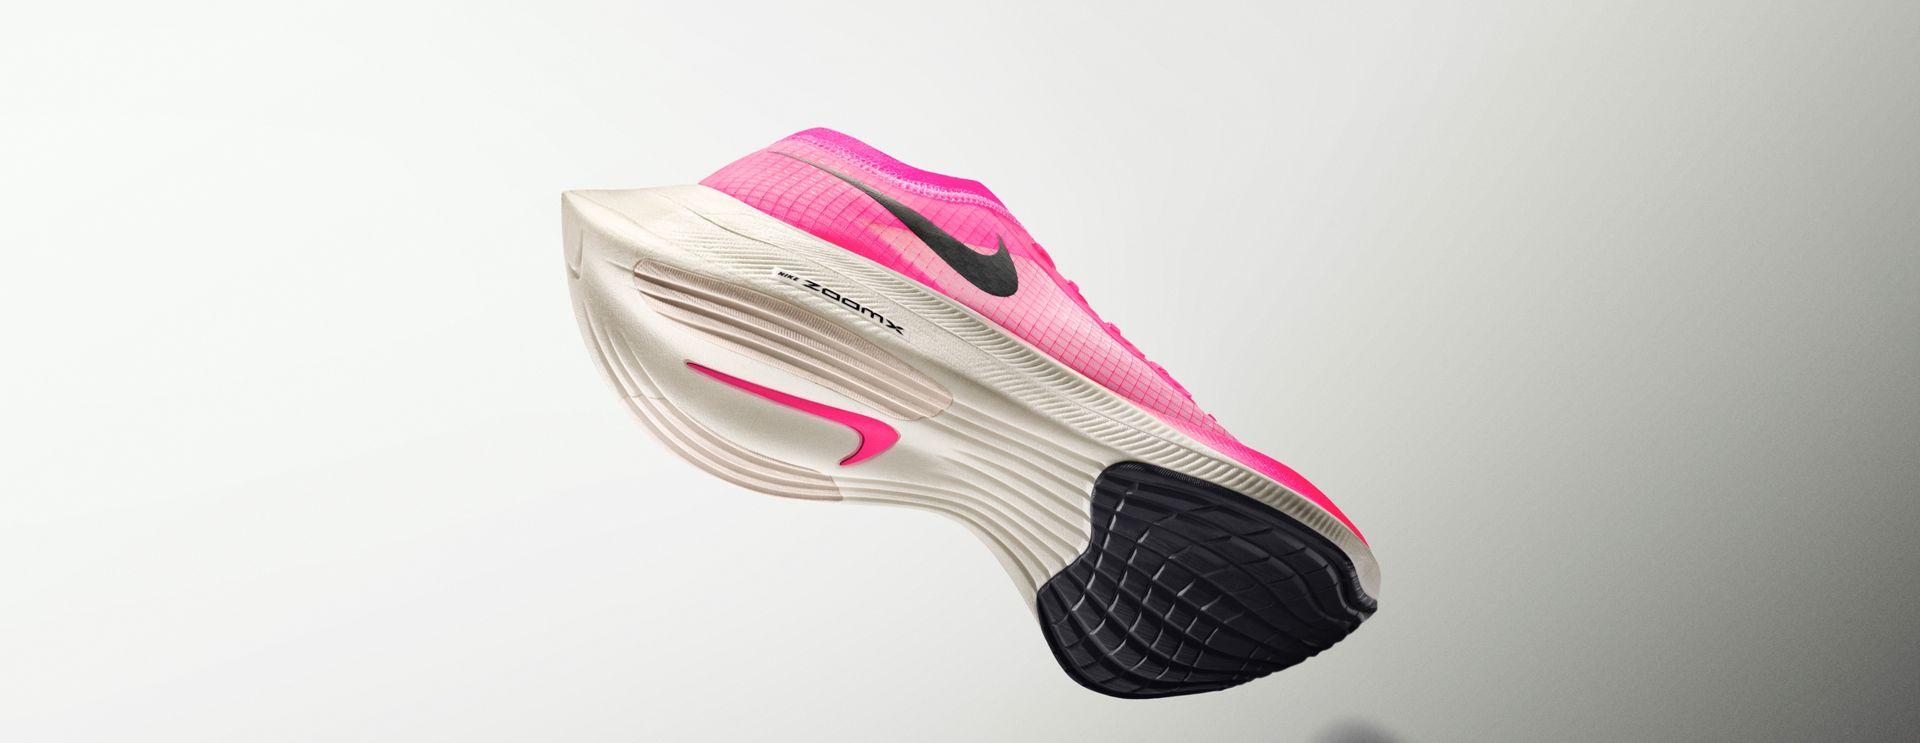 nike usa basketball jersey, Nike Free 3.0 V7 Womens Pink